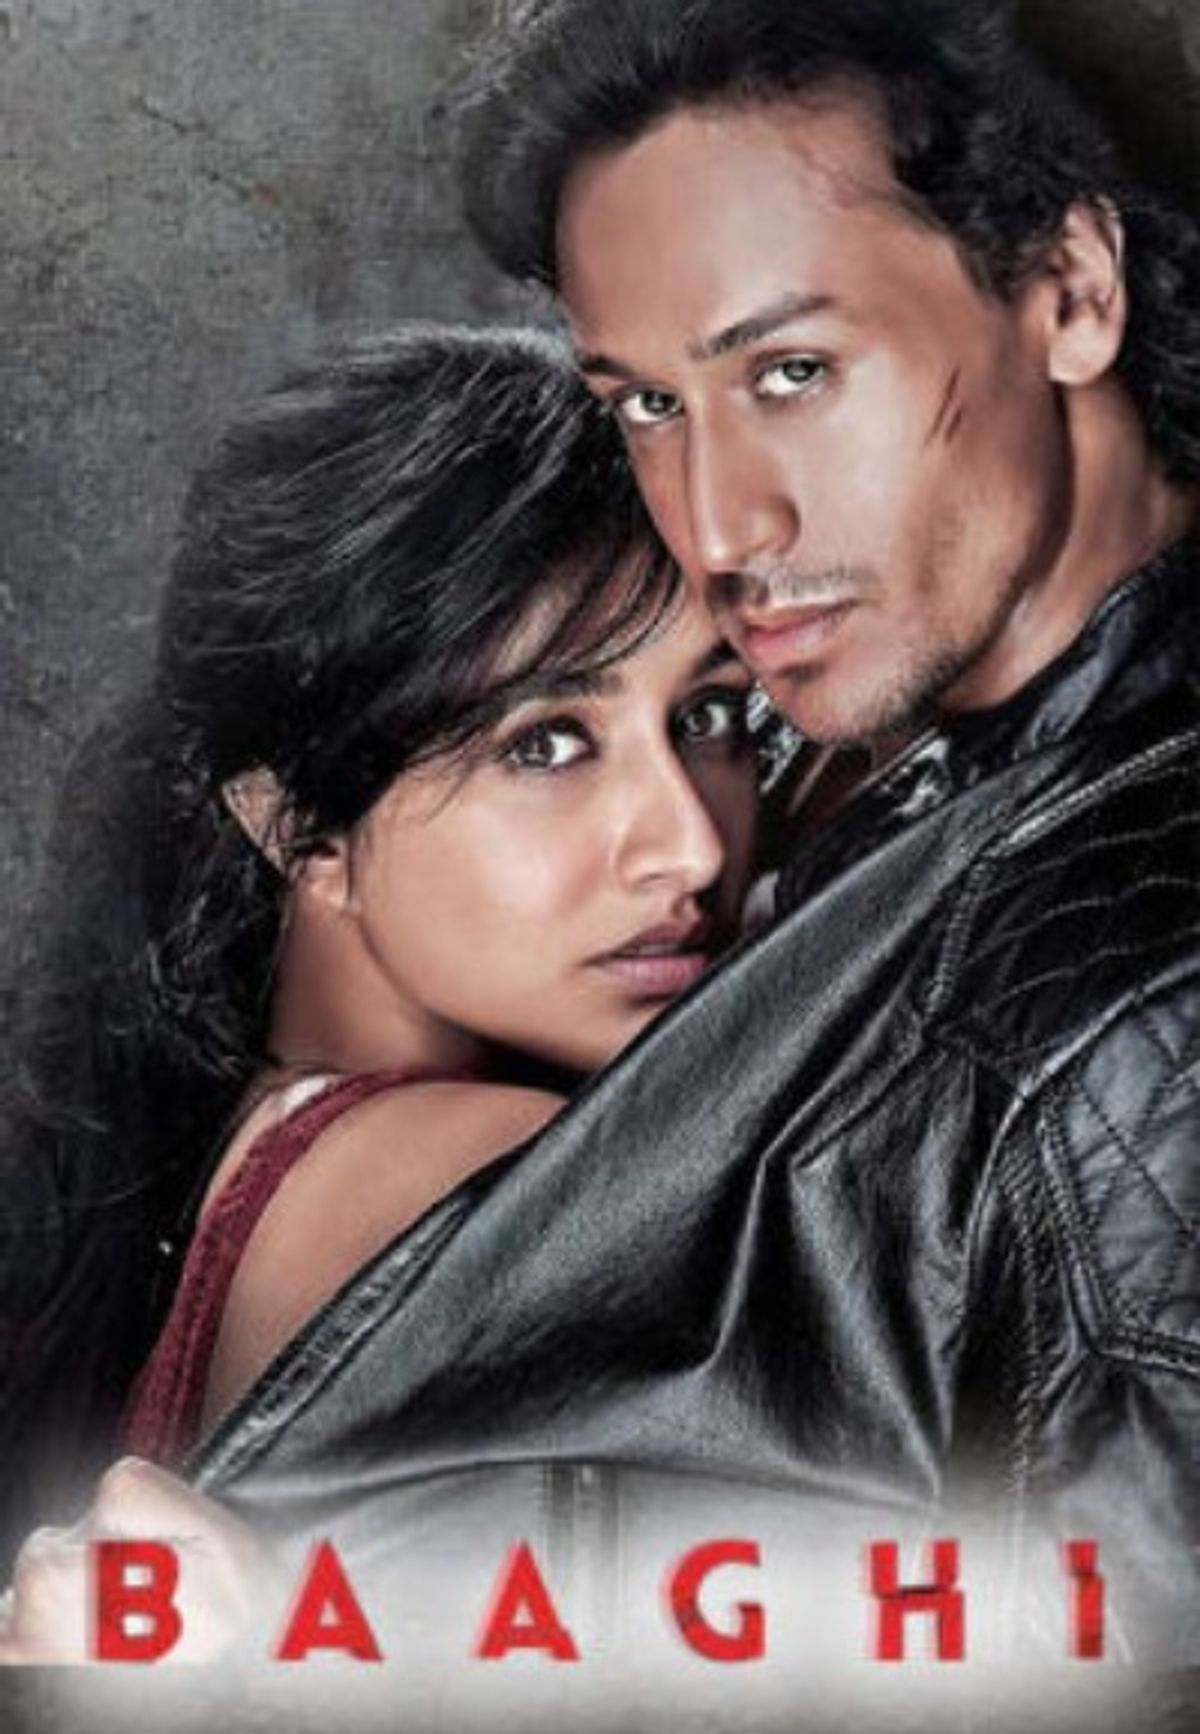 Baaghi: Rebels In Love